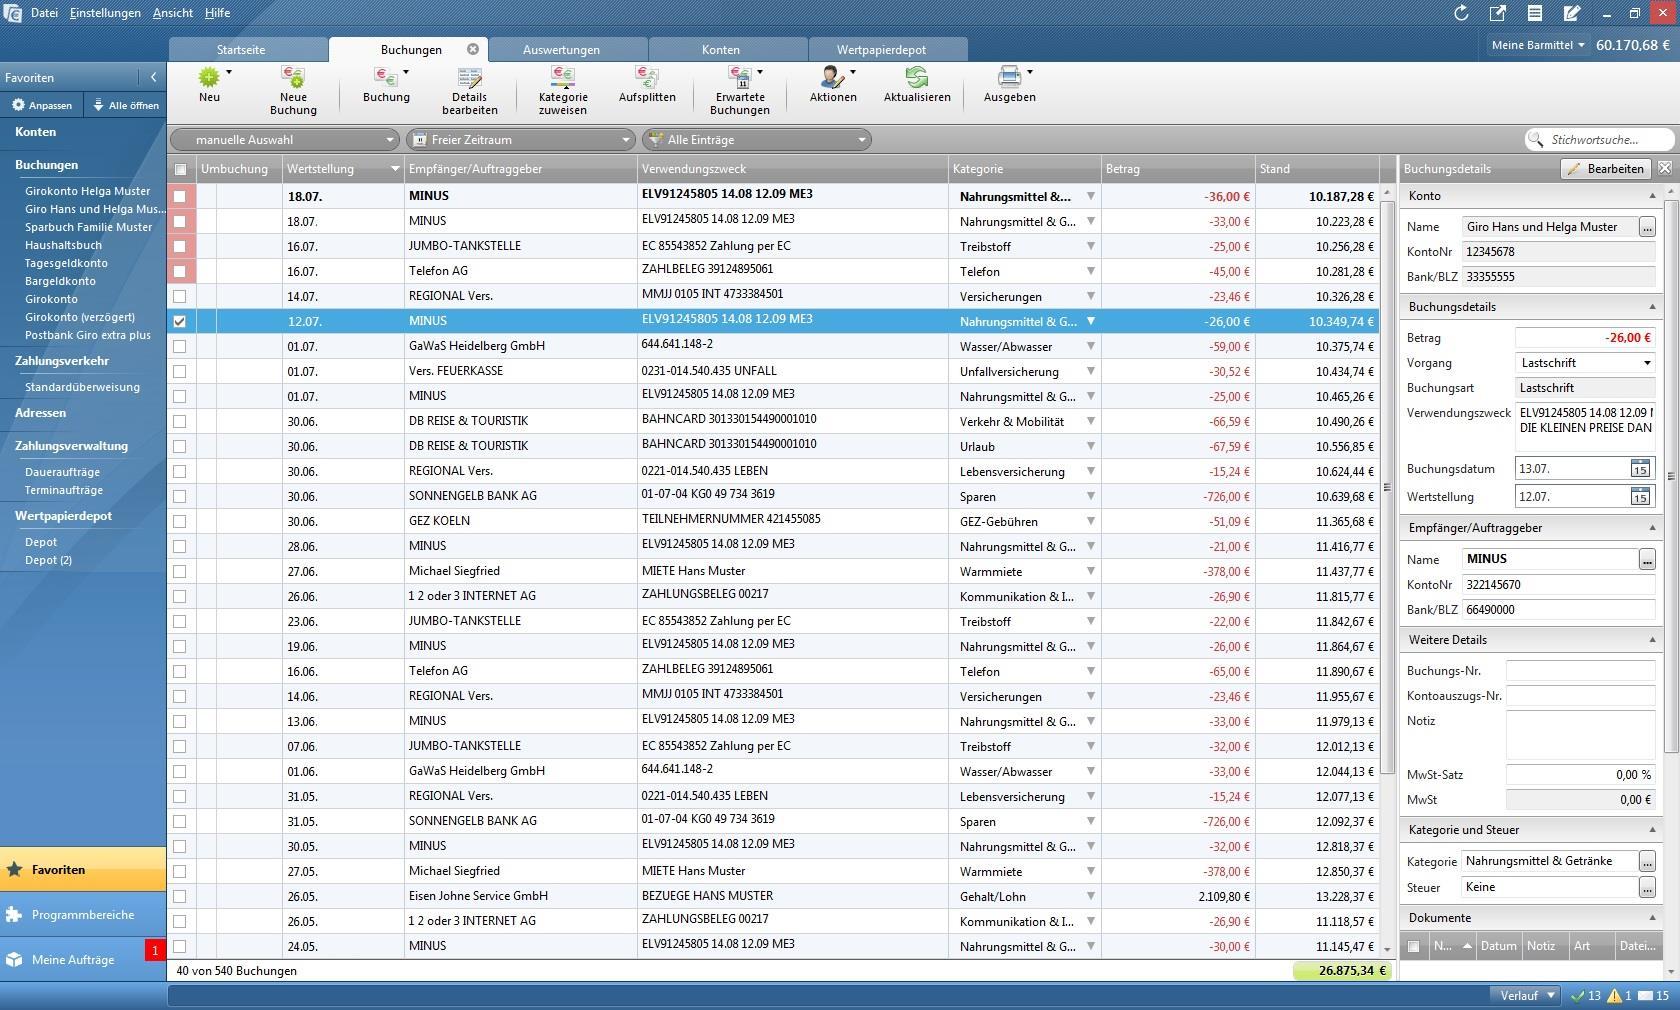 Buhl Data Service WISO Mein Geld Professional 3...